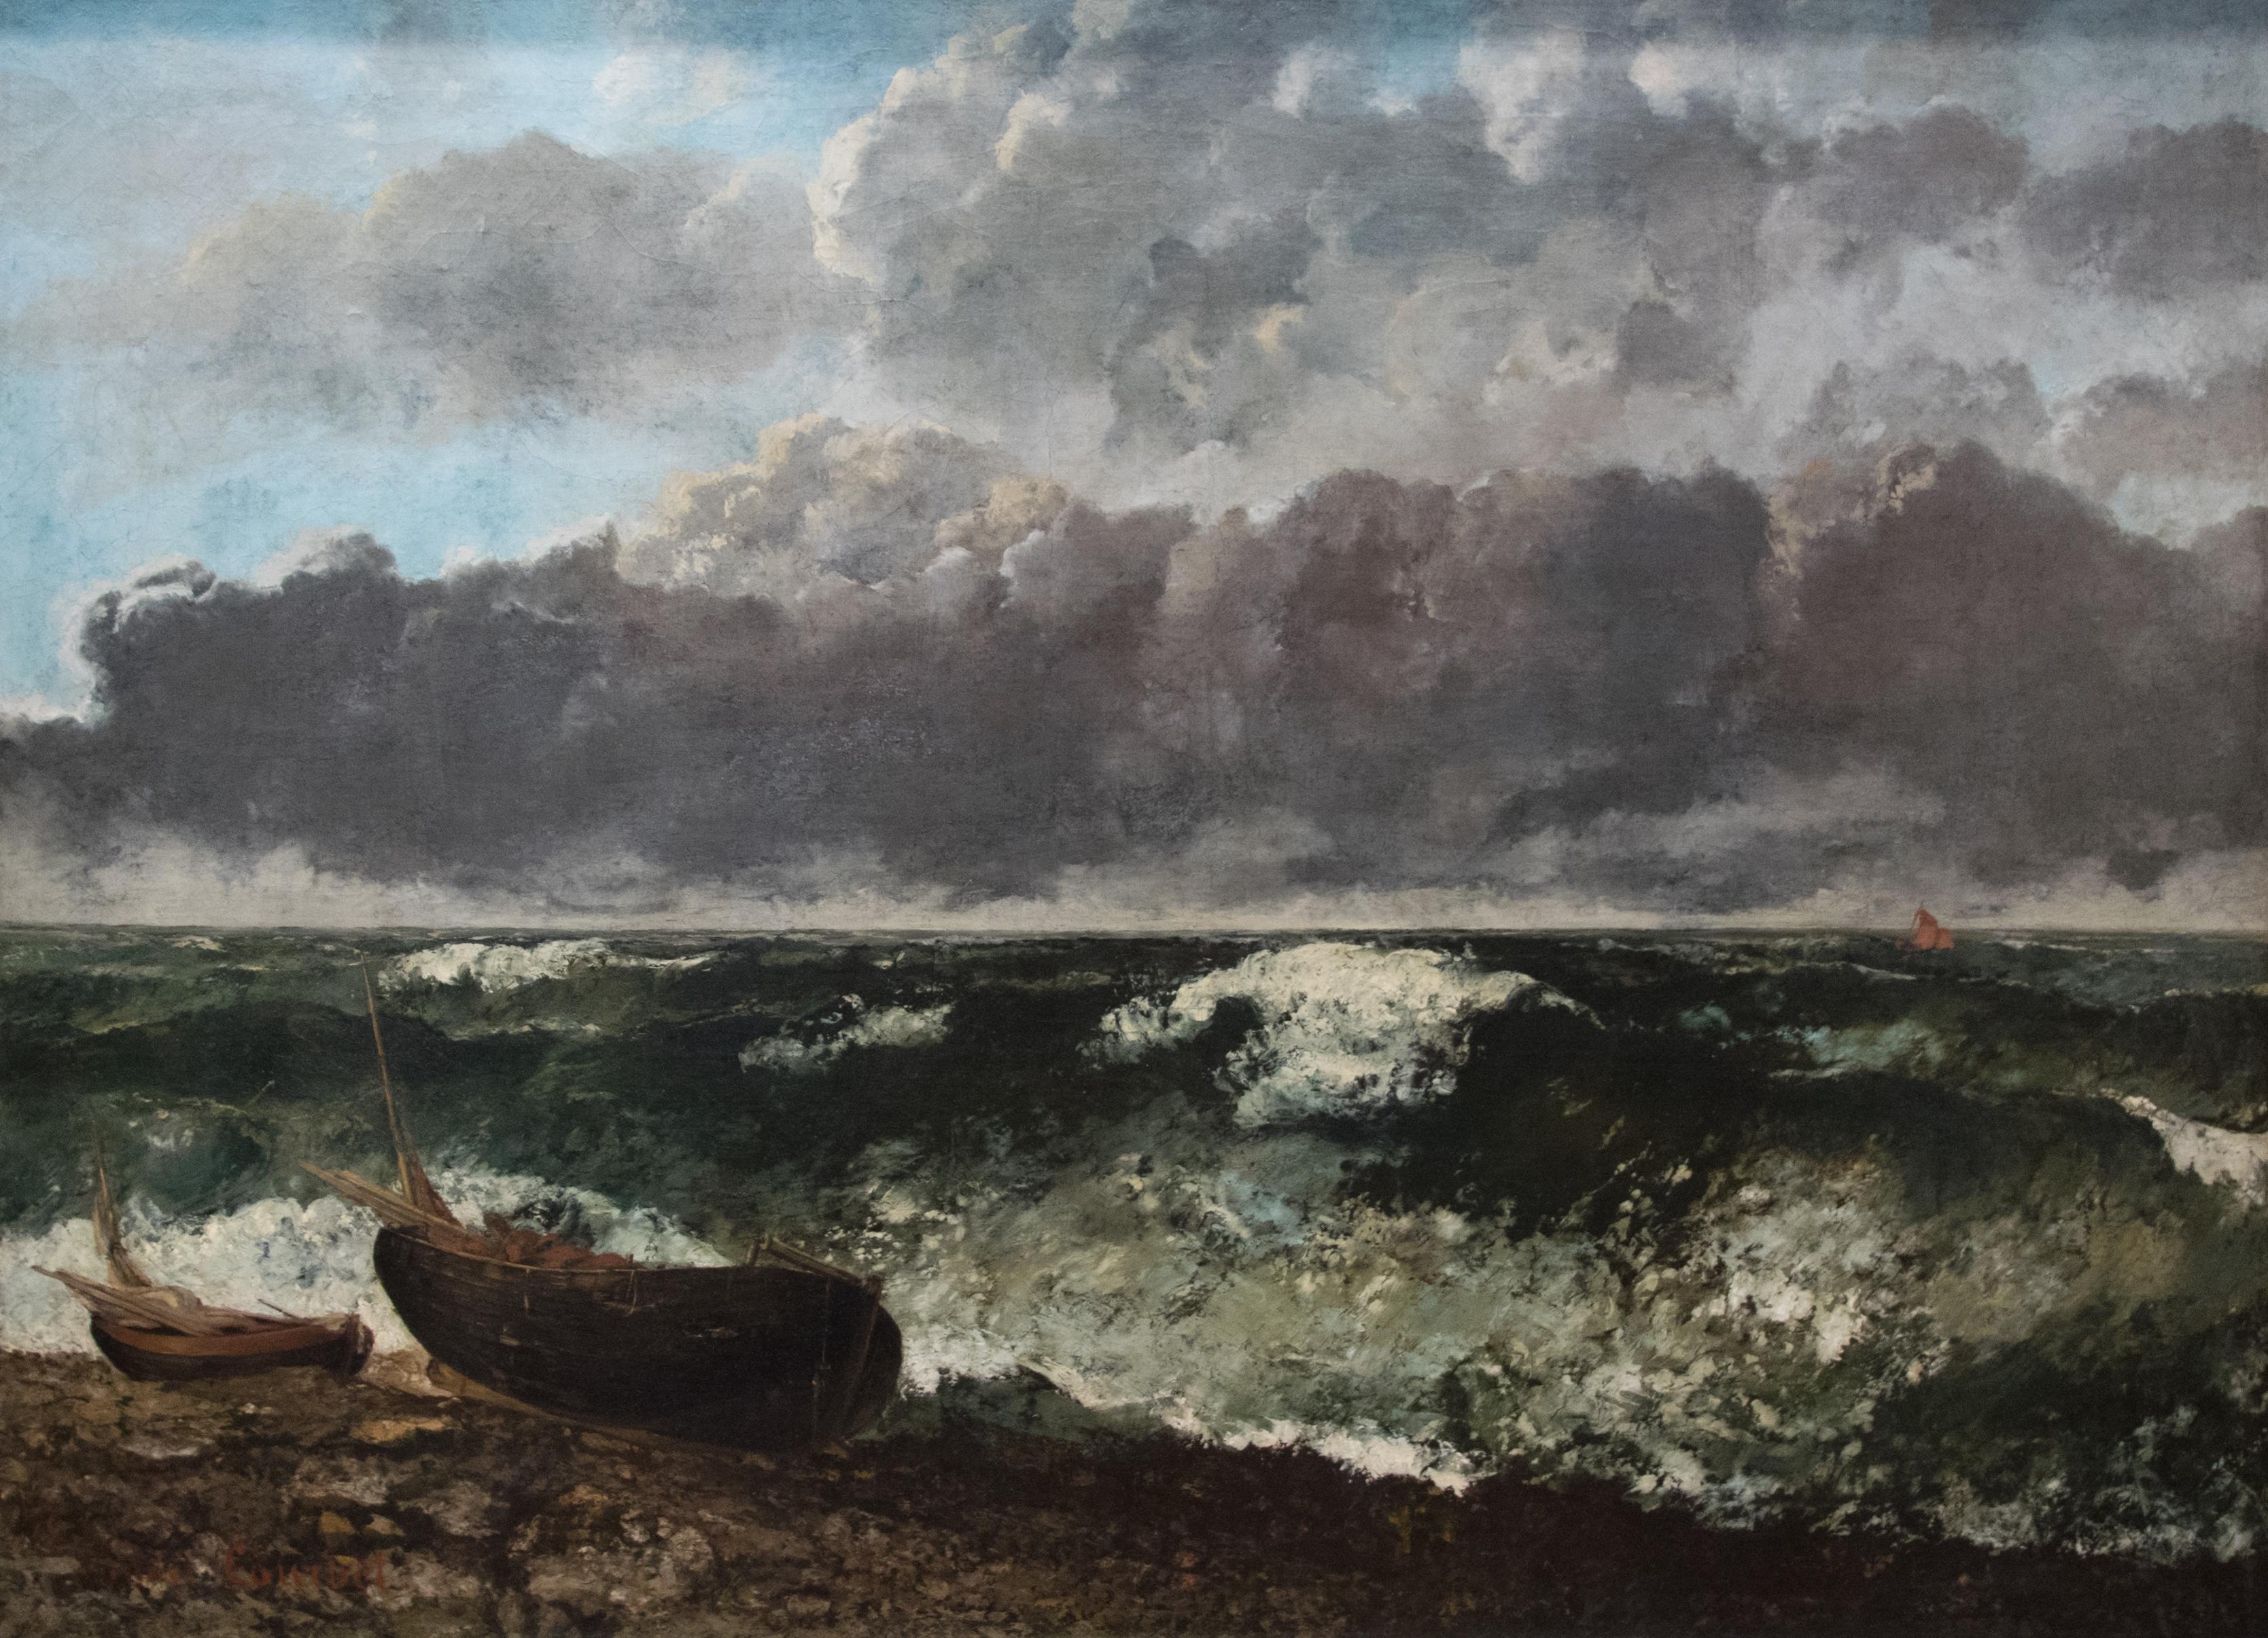 La_Mer_orageuse_-_Gustave_Courbet